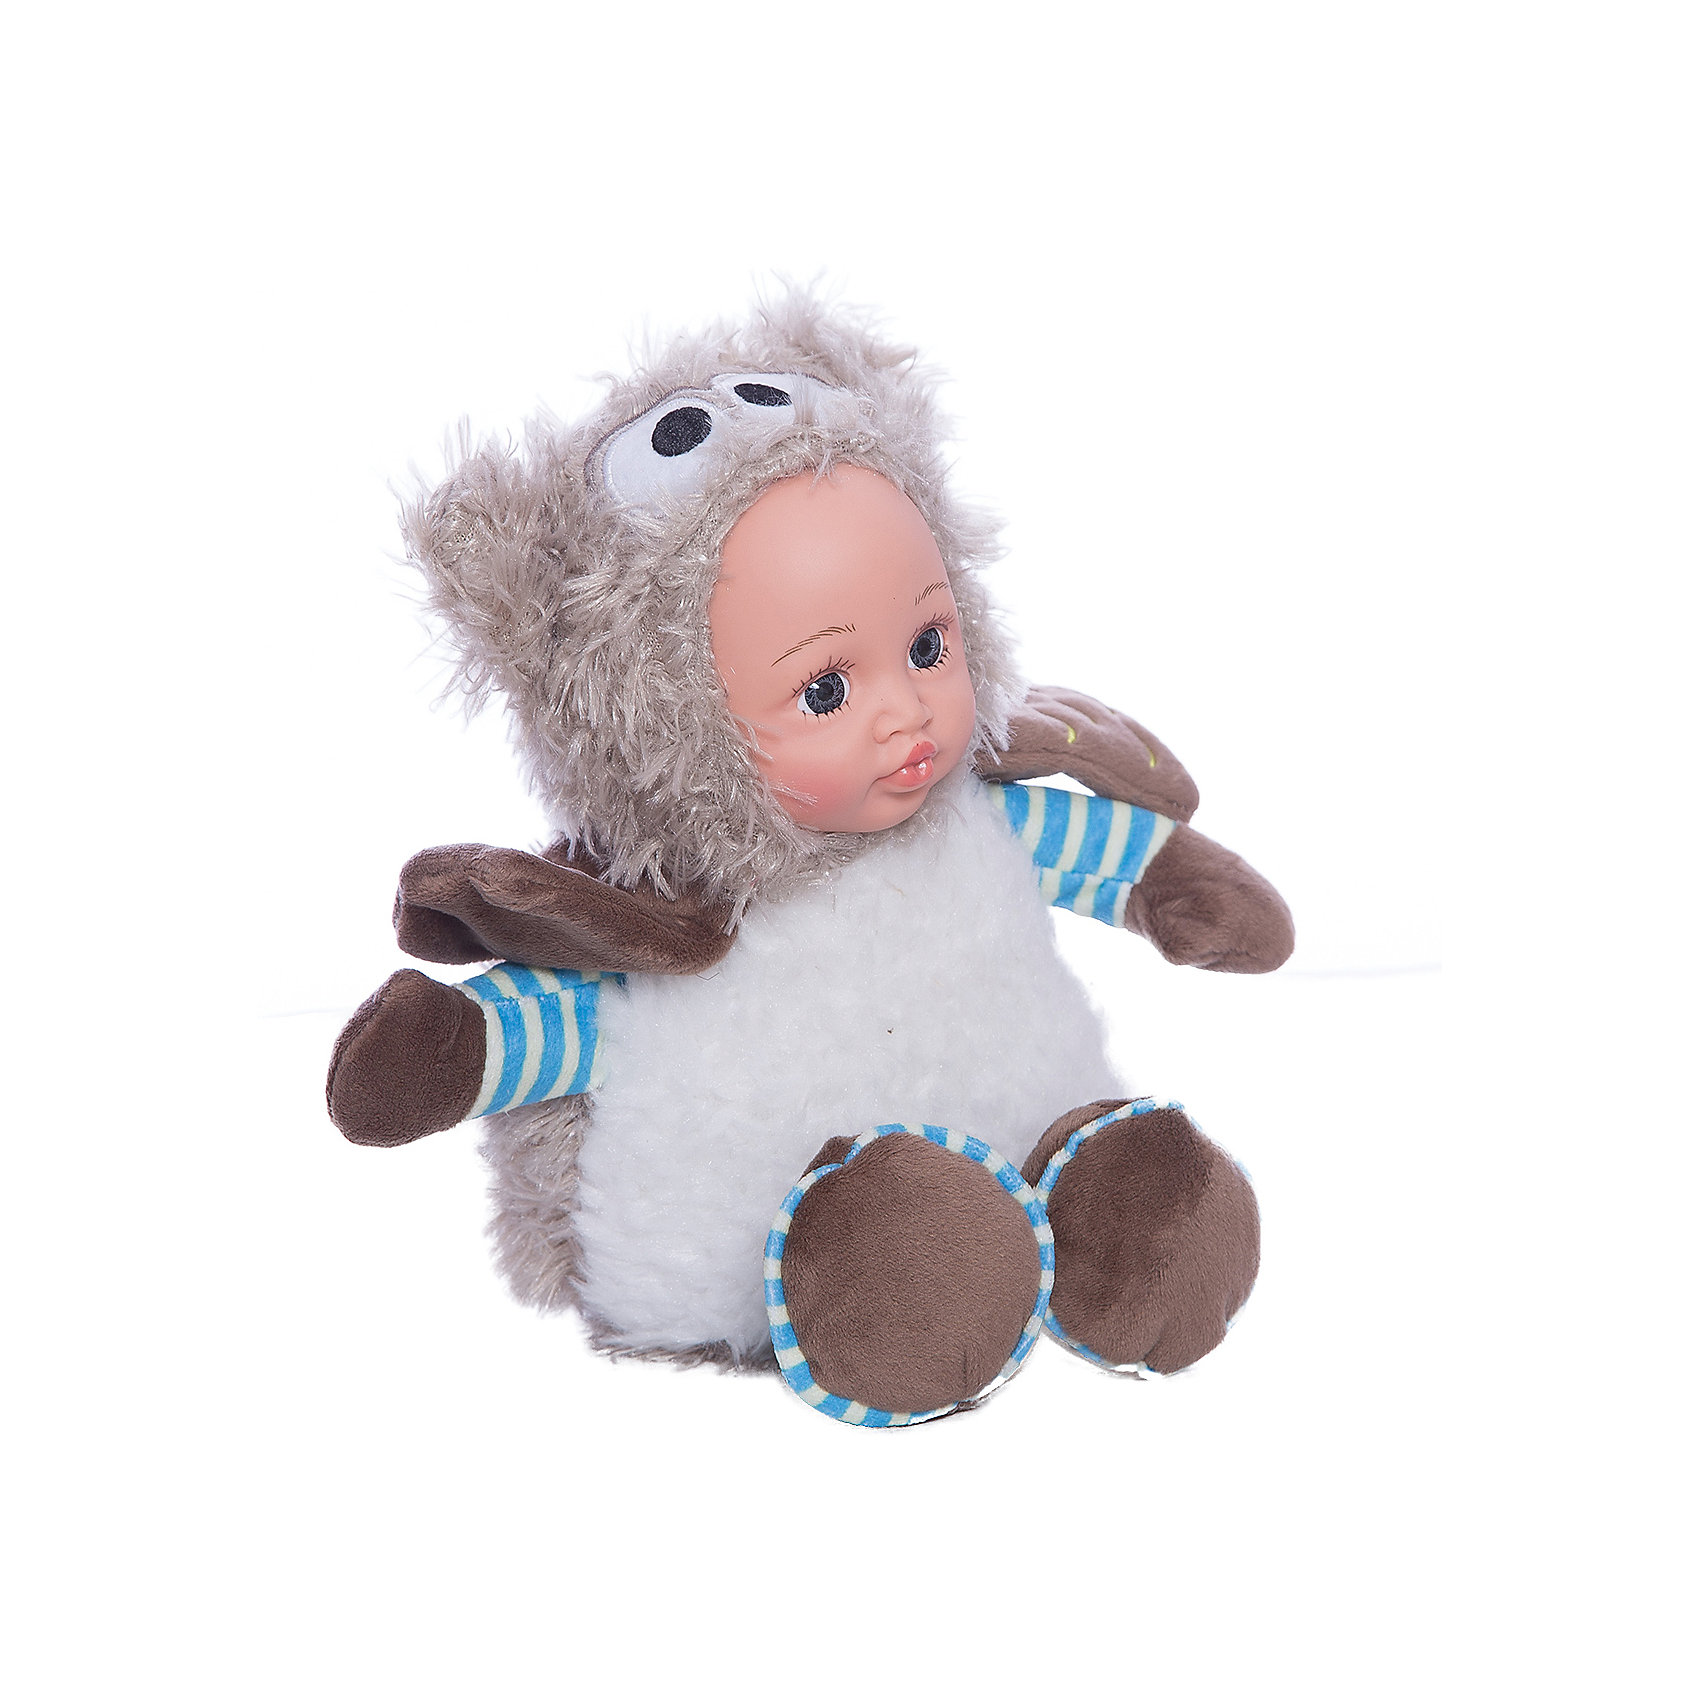 Fluffy Family Игрушка Мой совенок, Fluffy Family игрушка мгка fluffy family диджей 681031